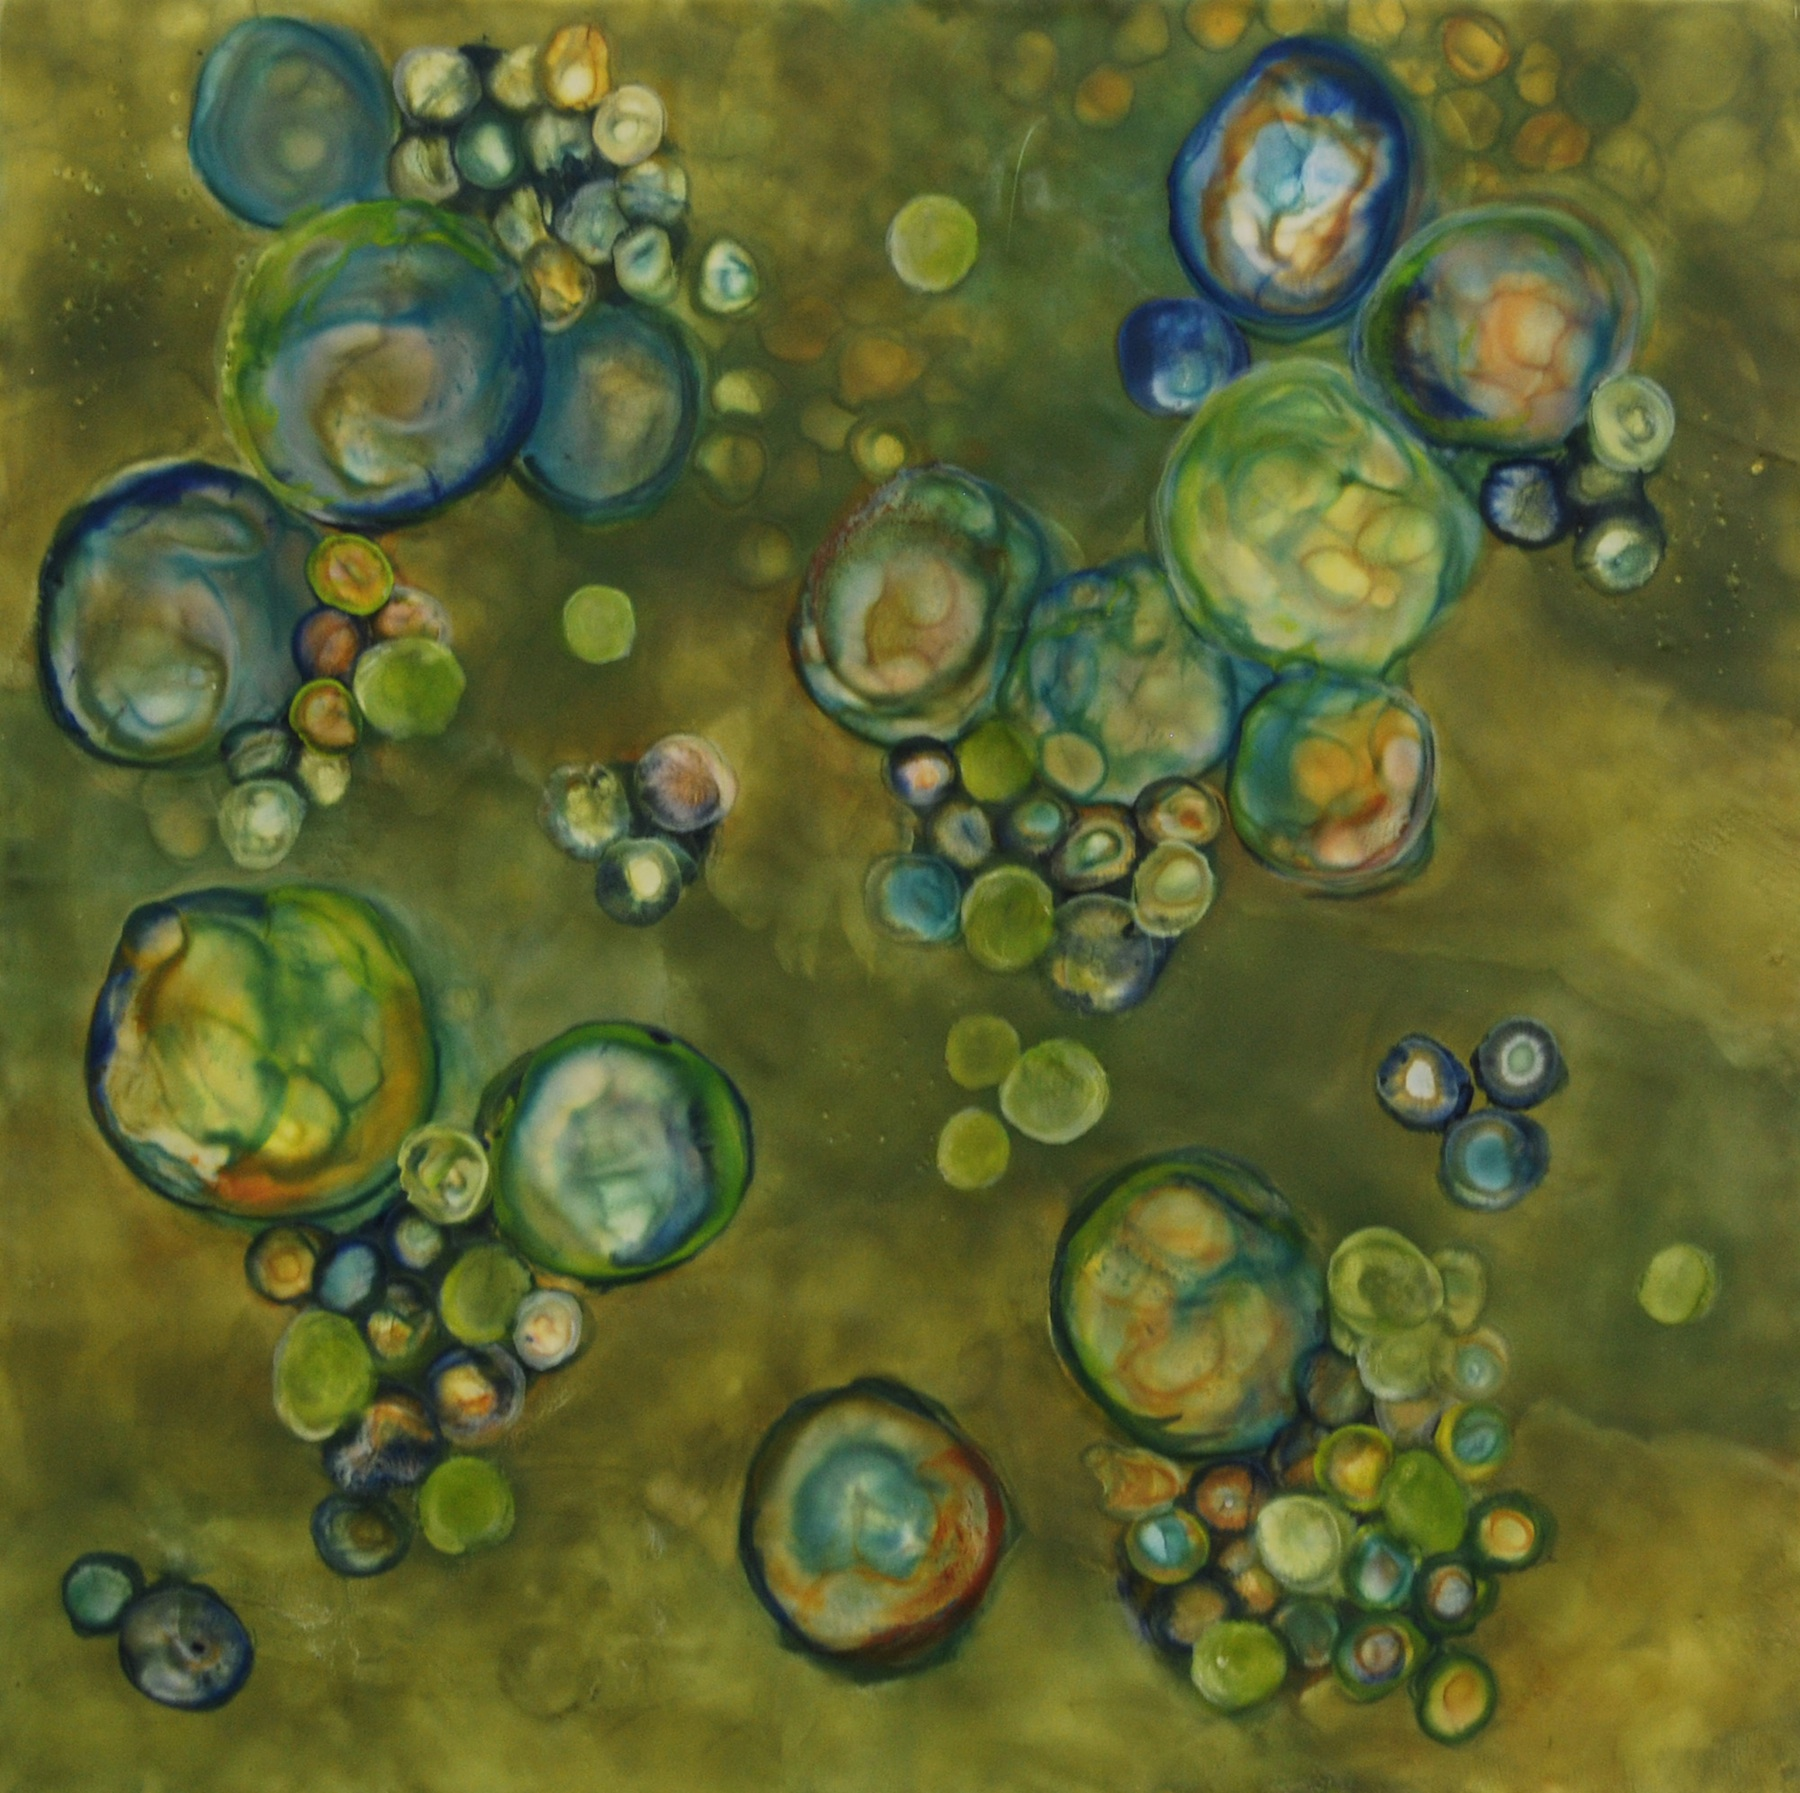 K. Hartung,  Bio Flow 8 , encaustic and mixed media, 24x24